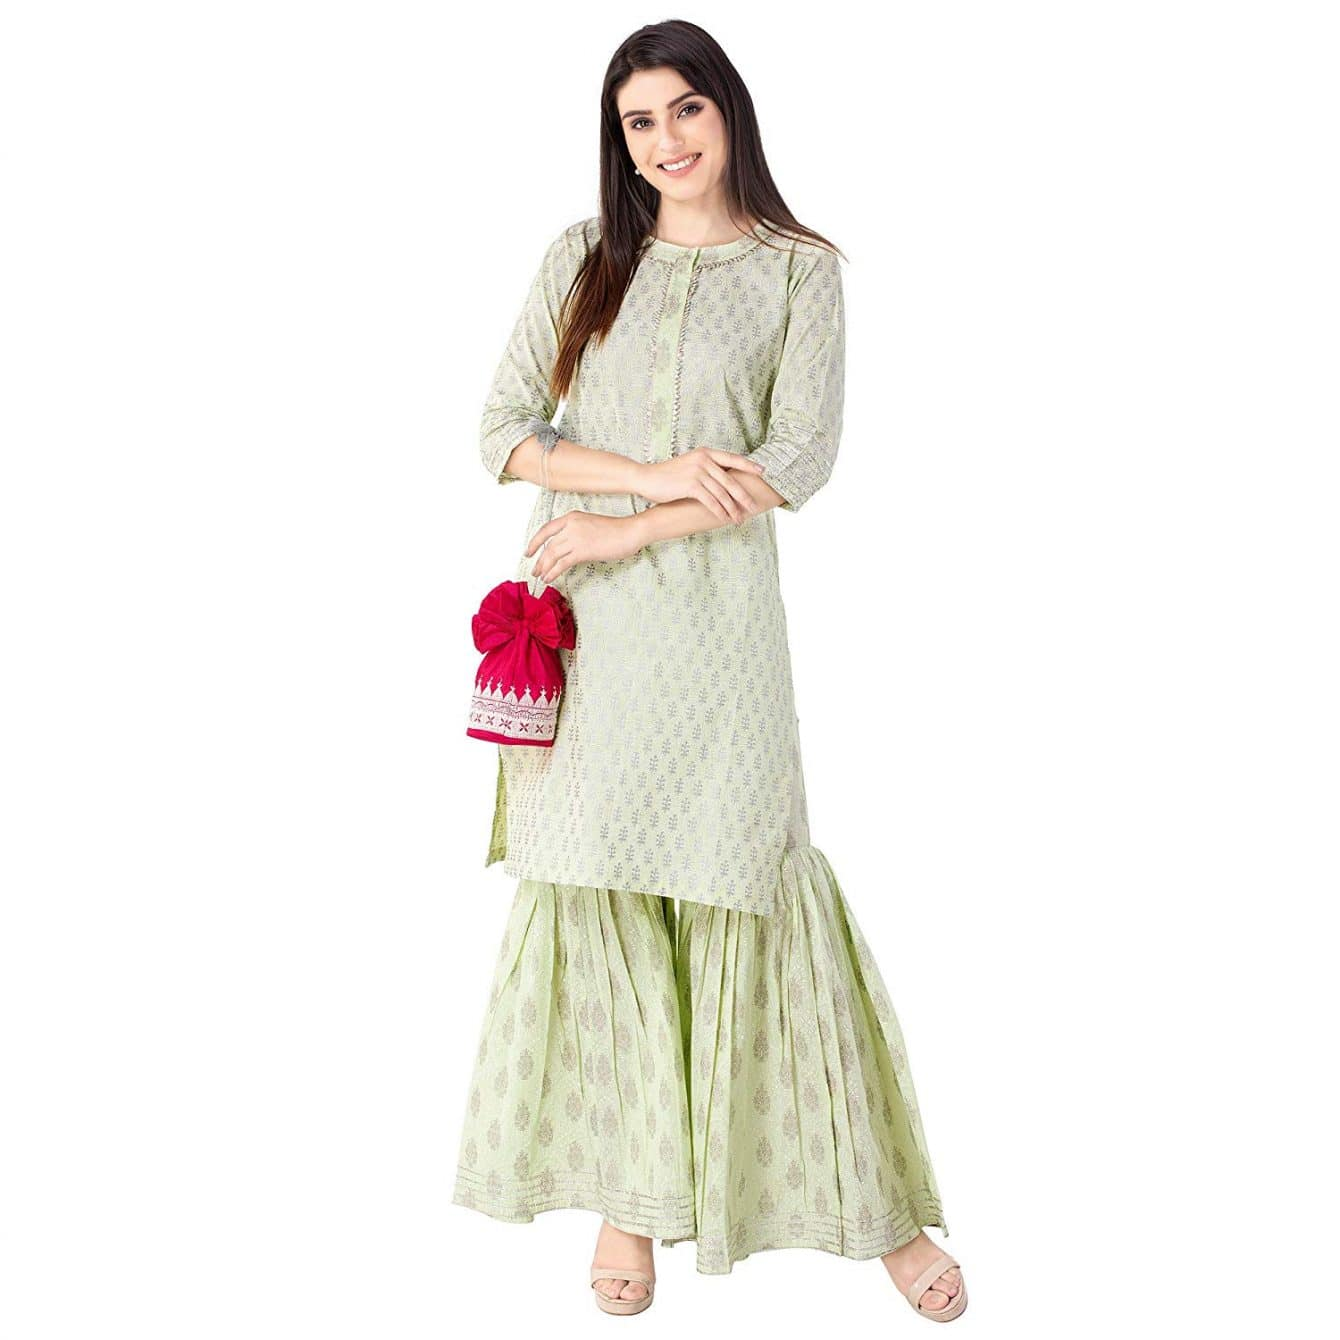 Women's cotton sharara suit